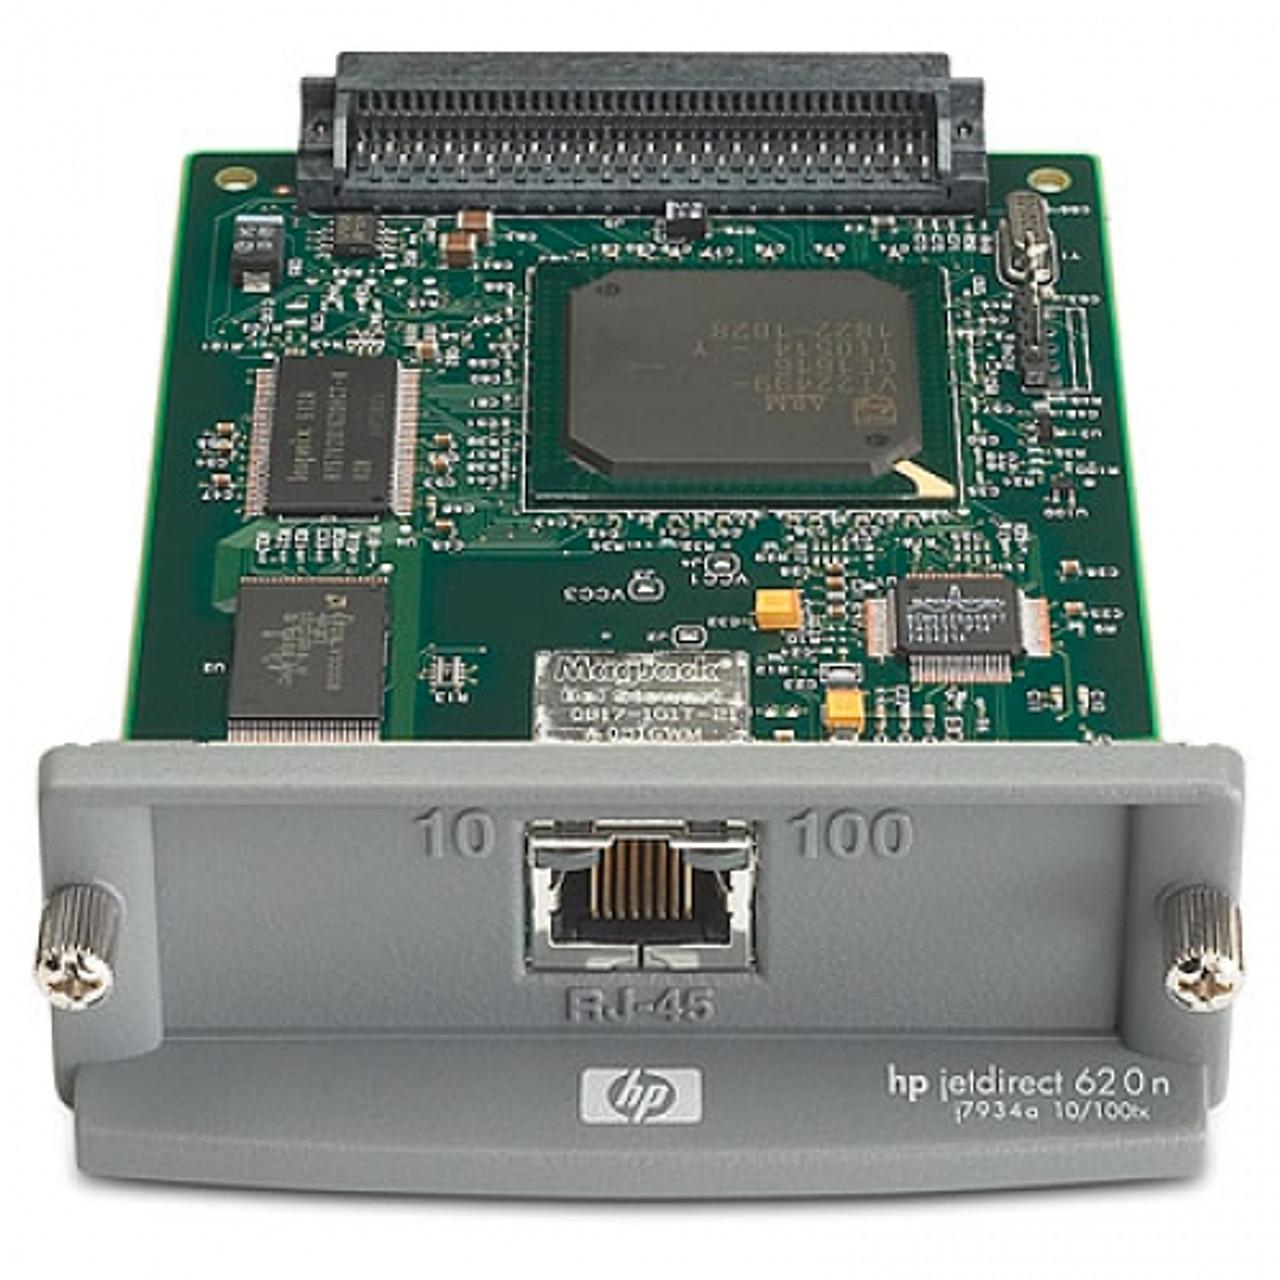 HP JetDirect 620n Ethernet Print server - EIO